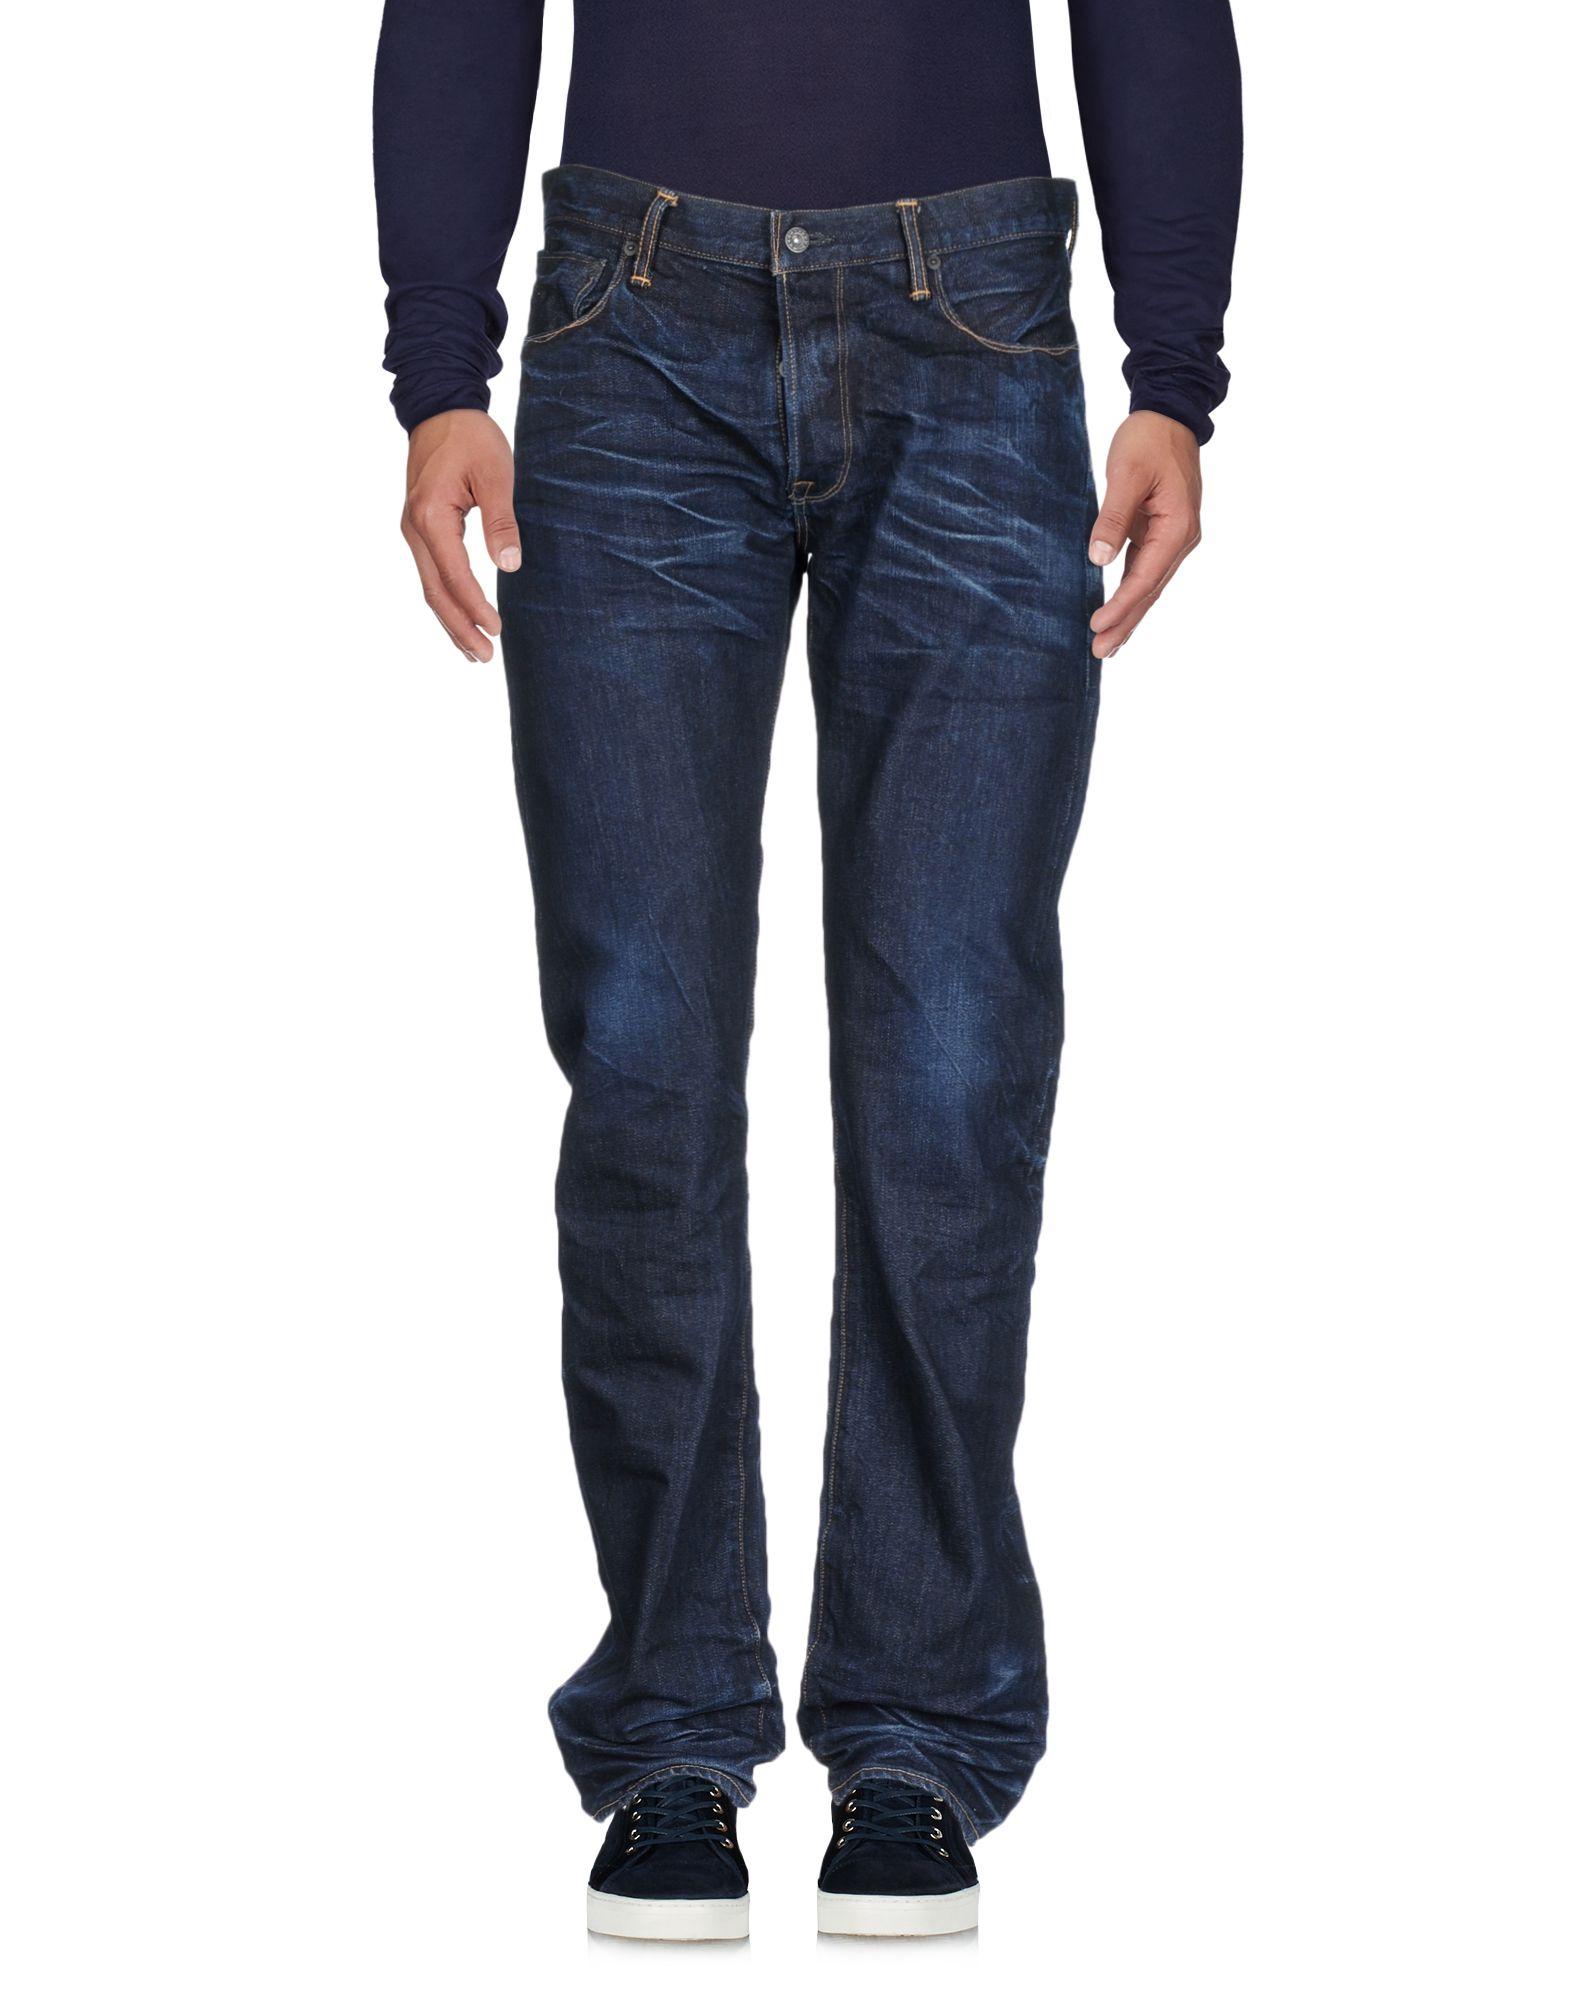 Pantaloni Jeans Kuro Donna - Acquista online su